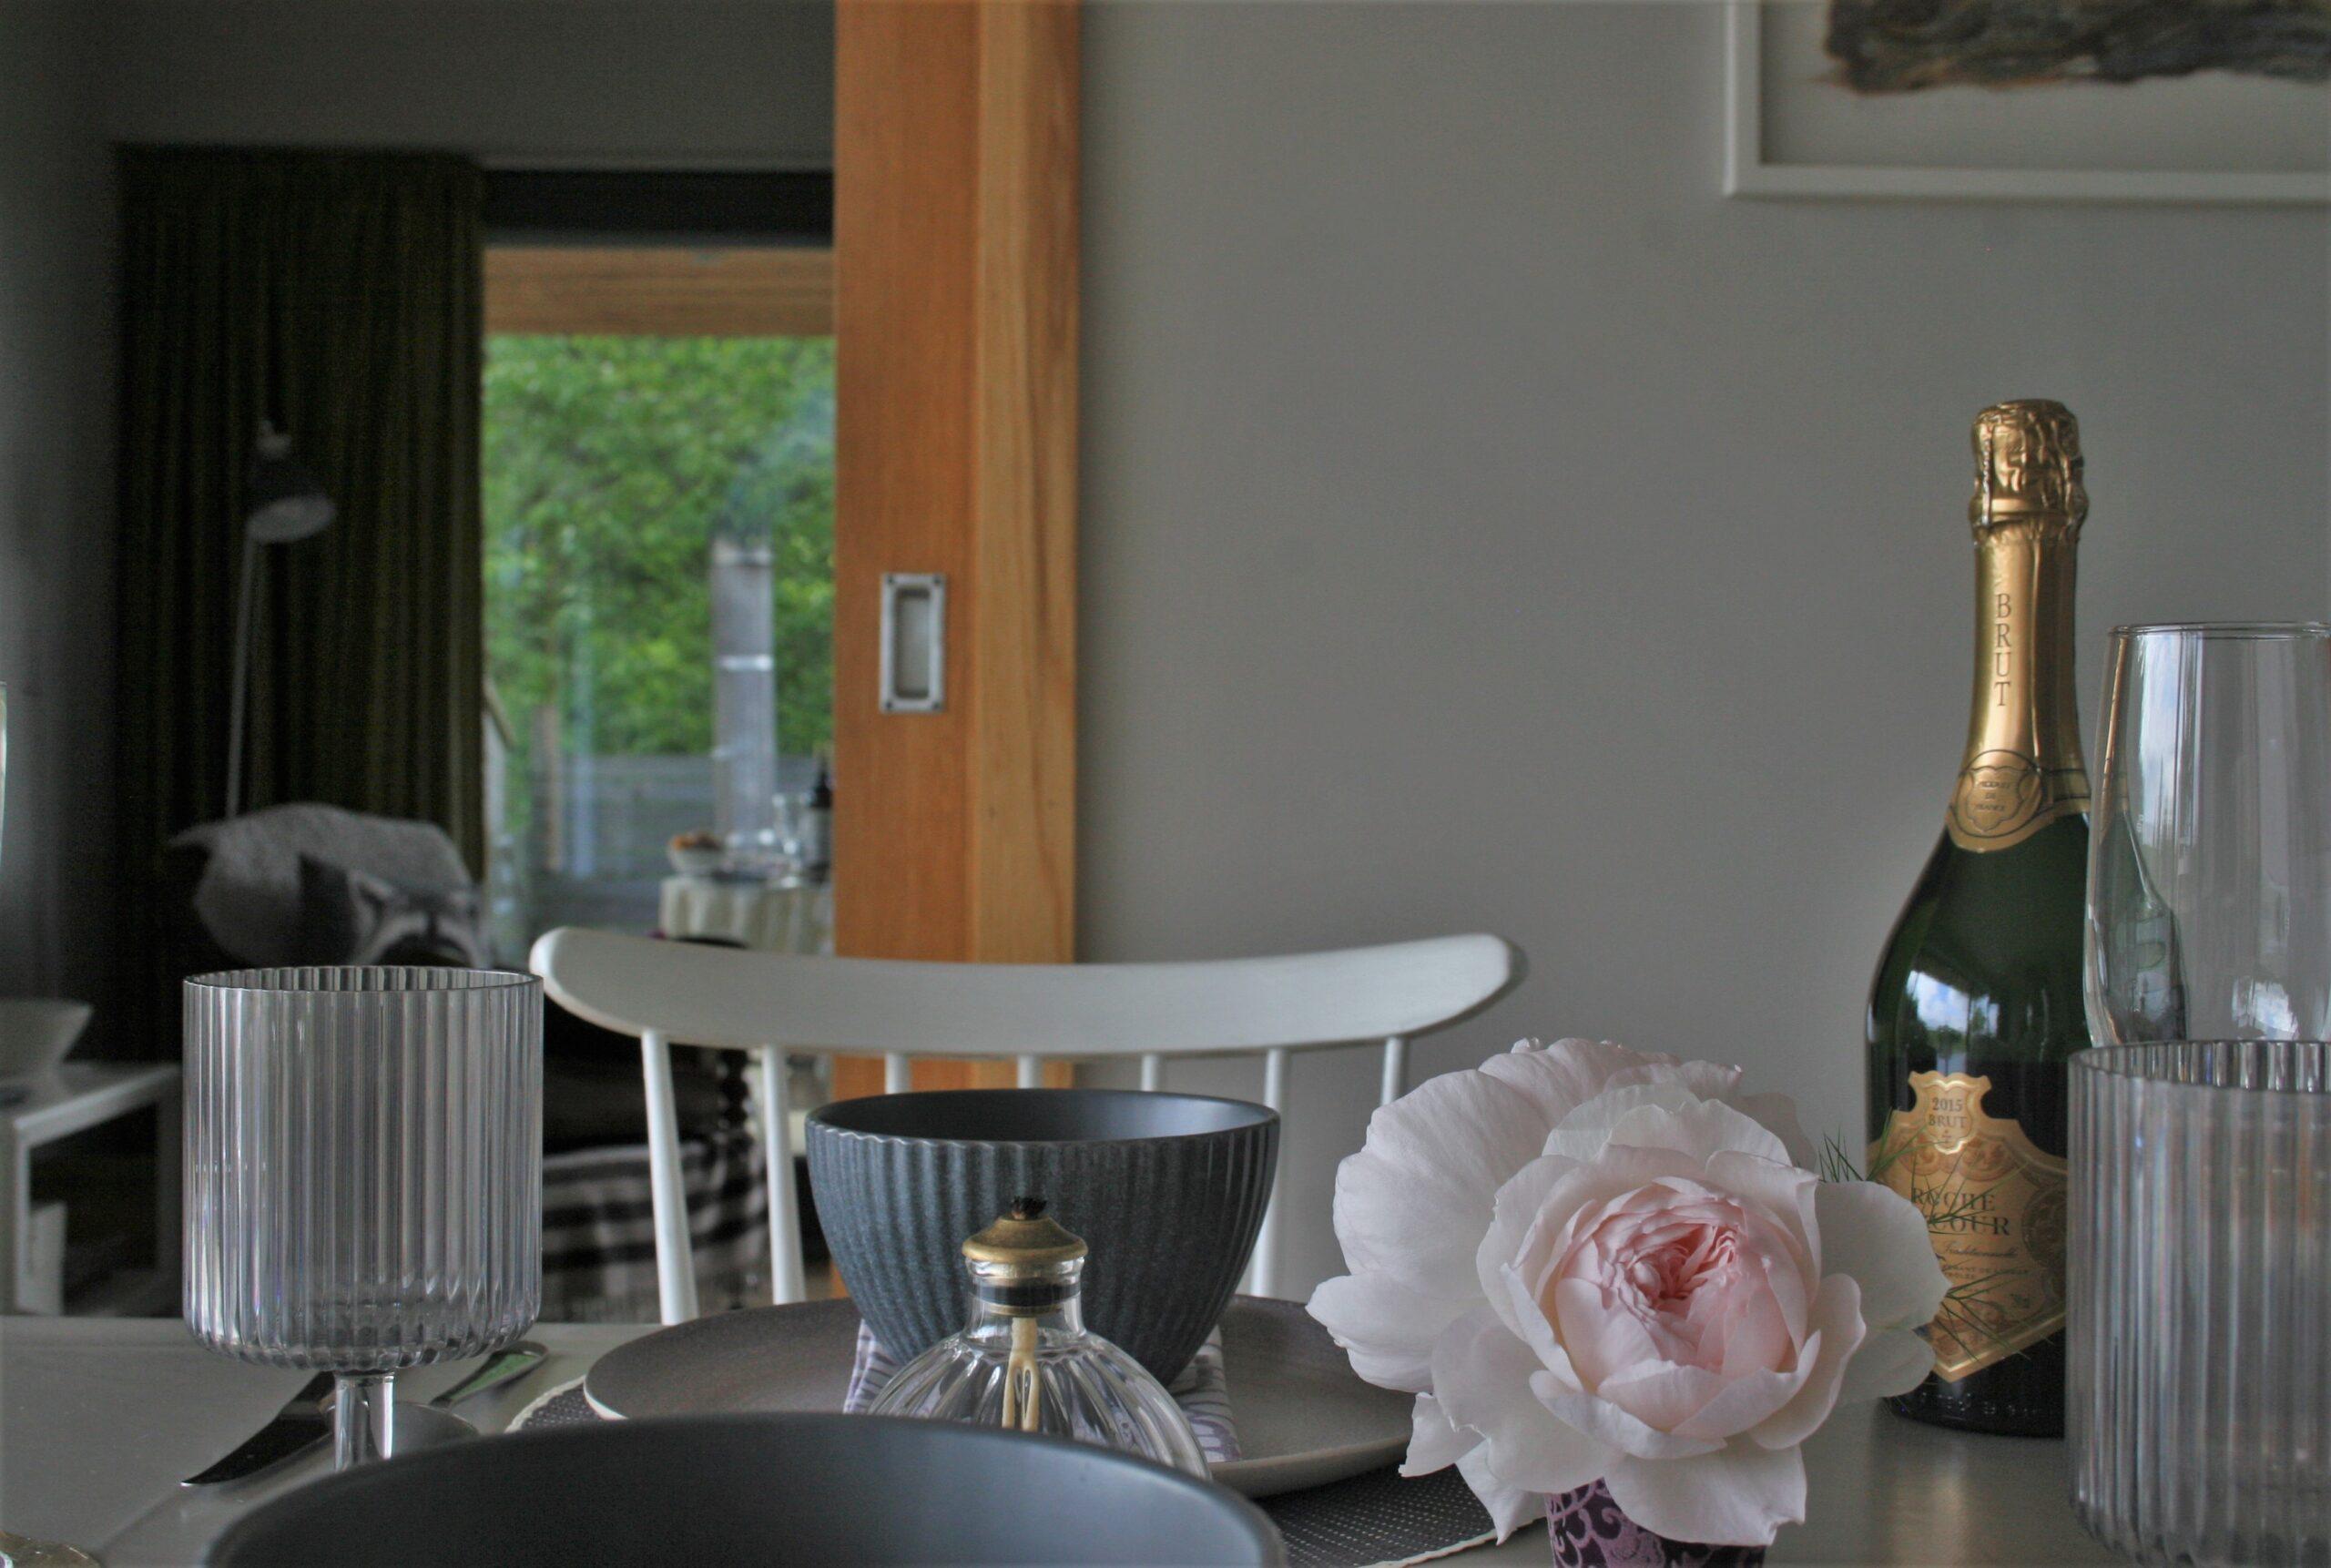 Copy of kitchen table landscape